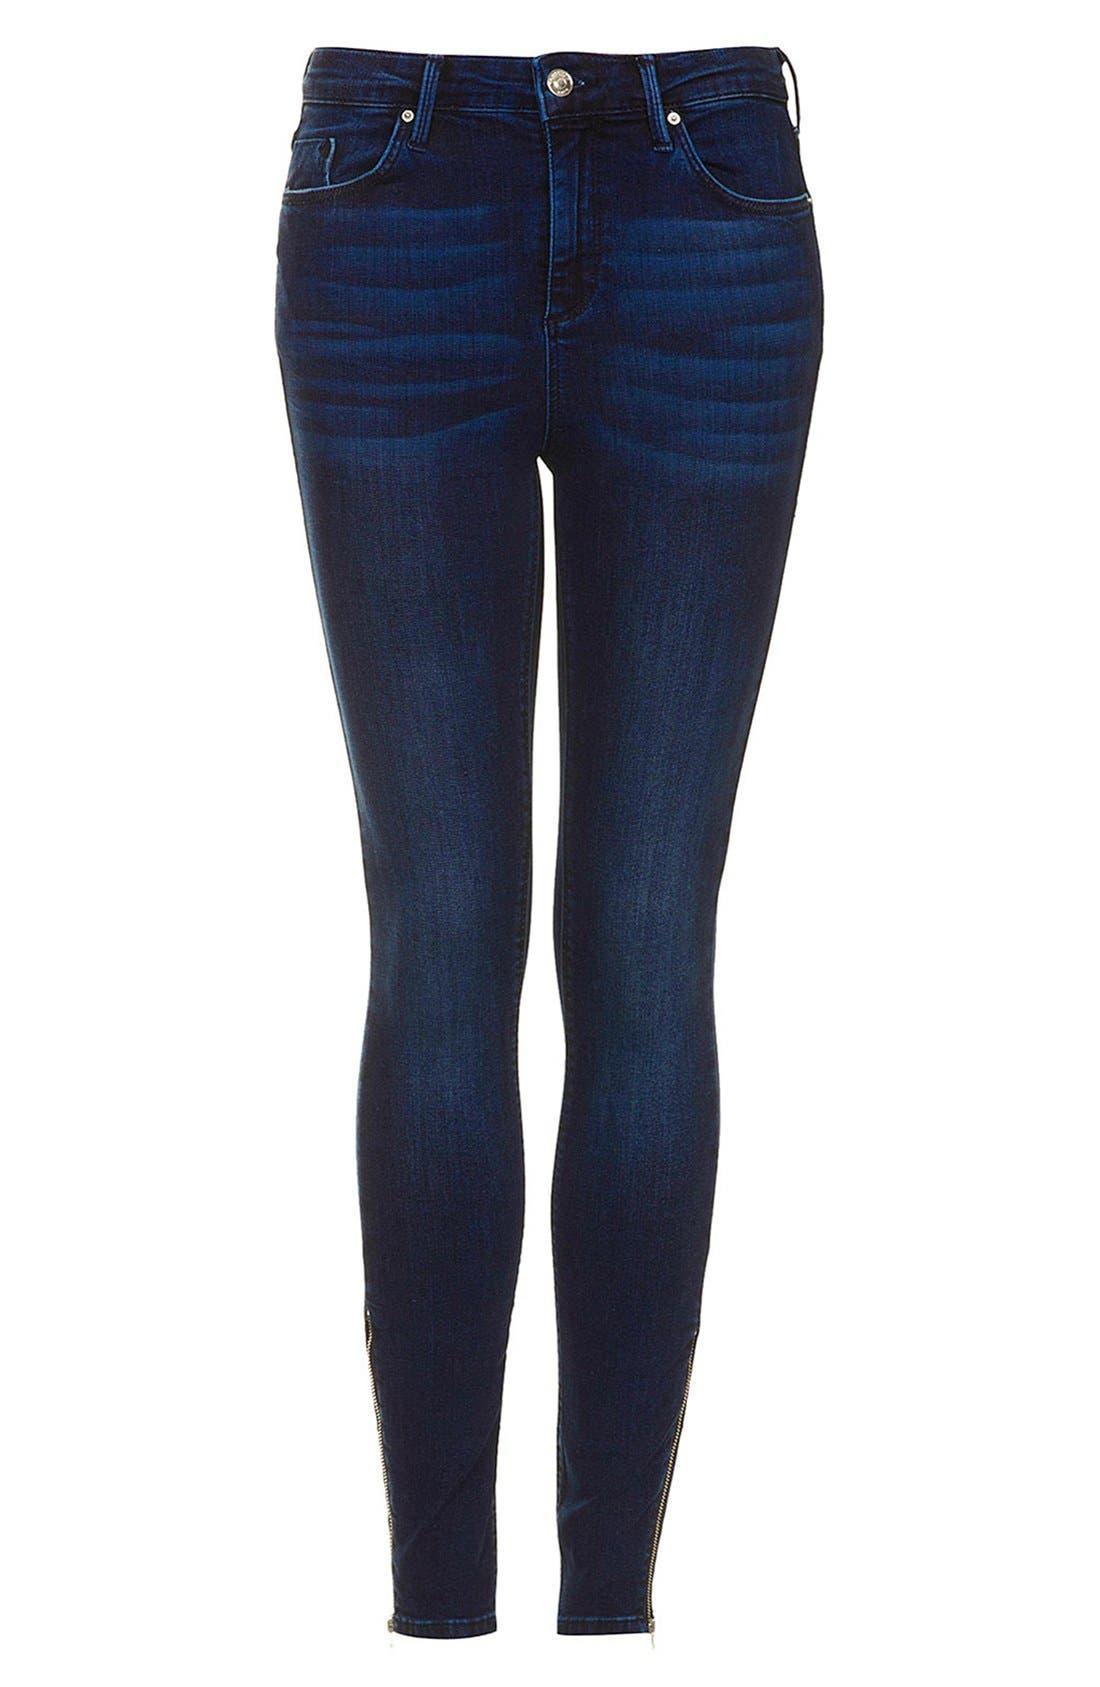 Alternate Image 3  - Topshop Moto 'Jamie' Zip Cuff High Waist Skinny Jeans (Dark)